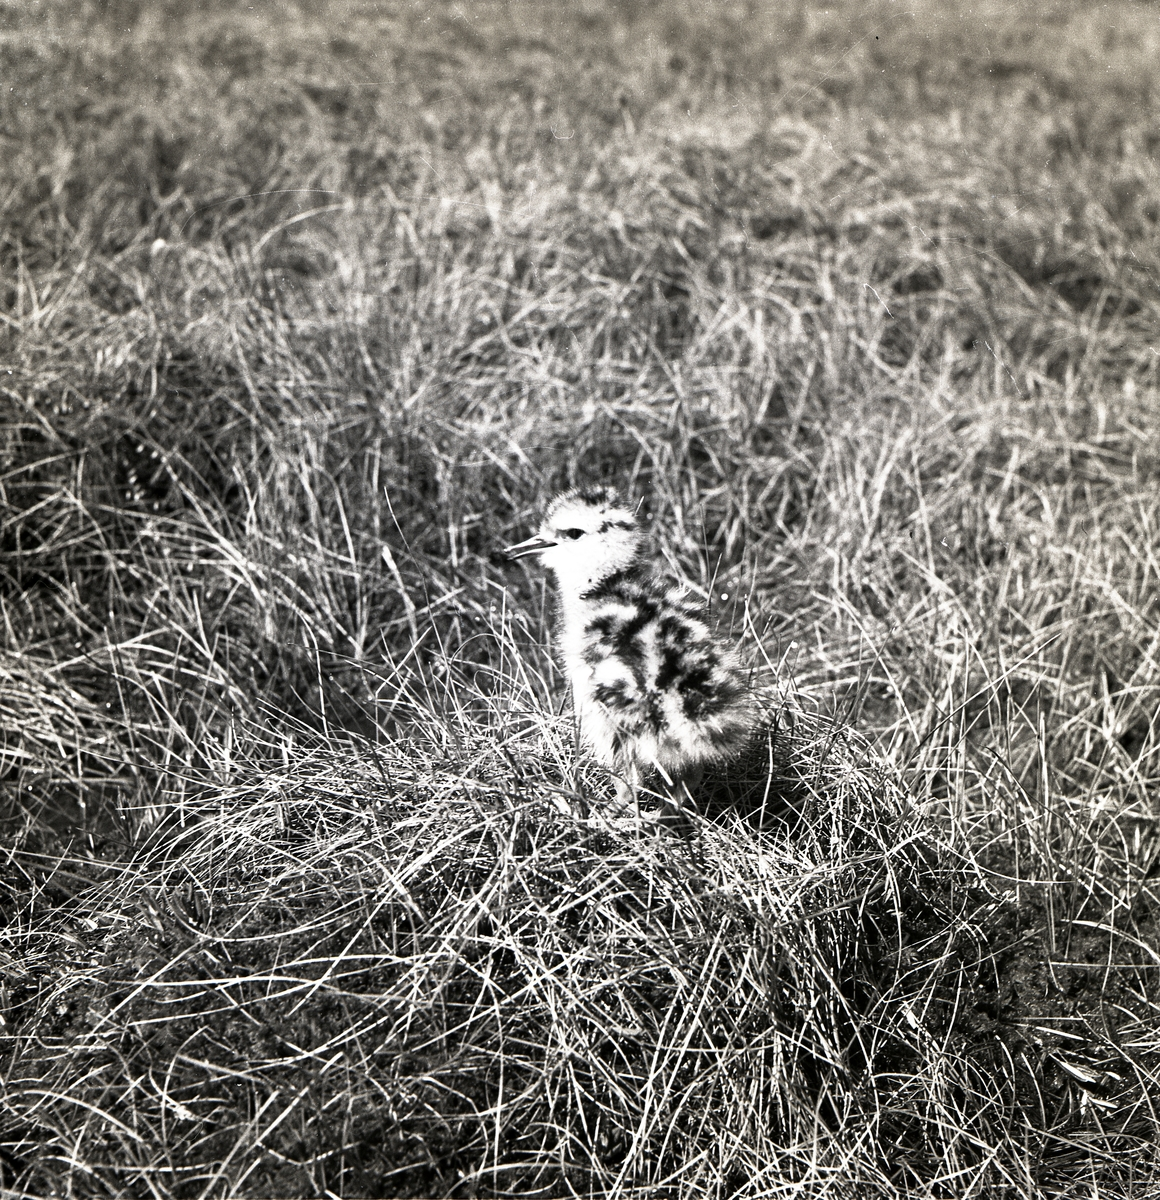 En spovunge står i gräs, juni 1950.